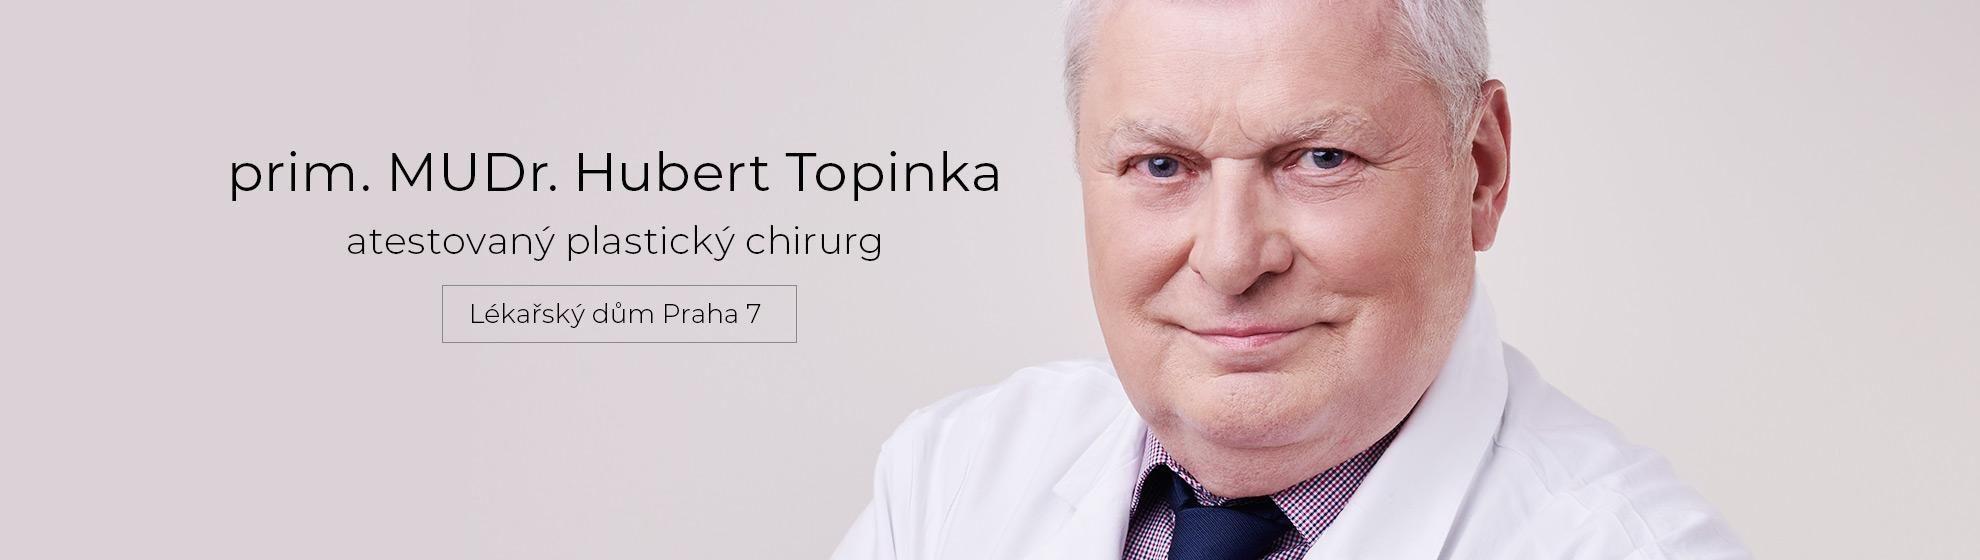 Prim. MUDr. Hubert Topinka